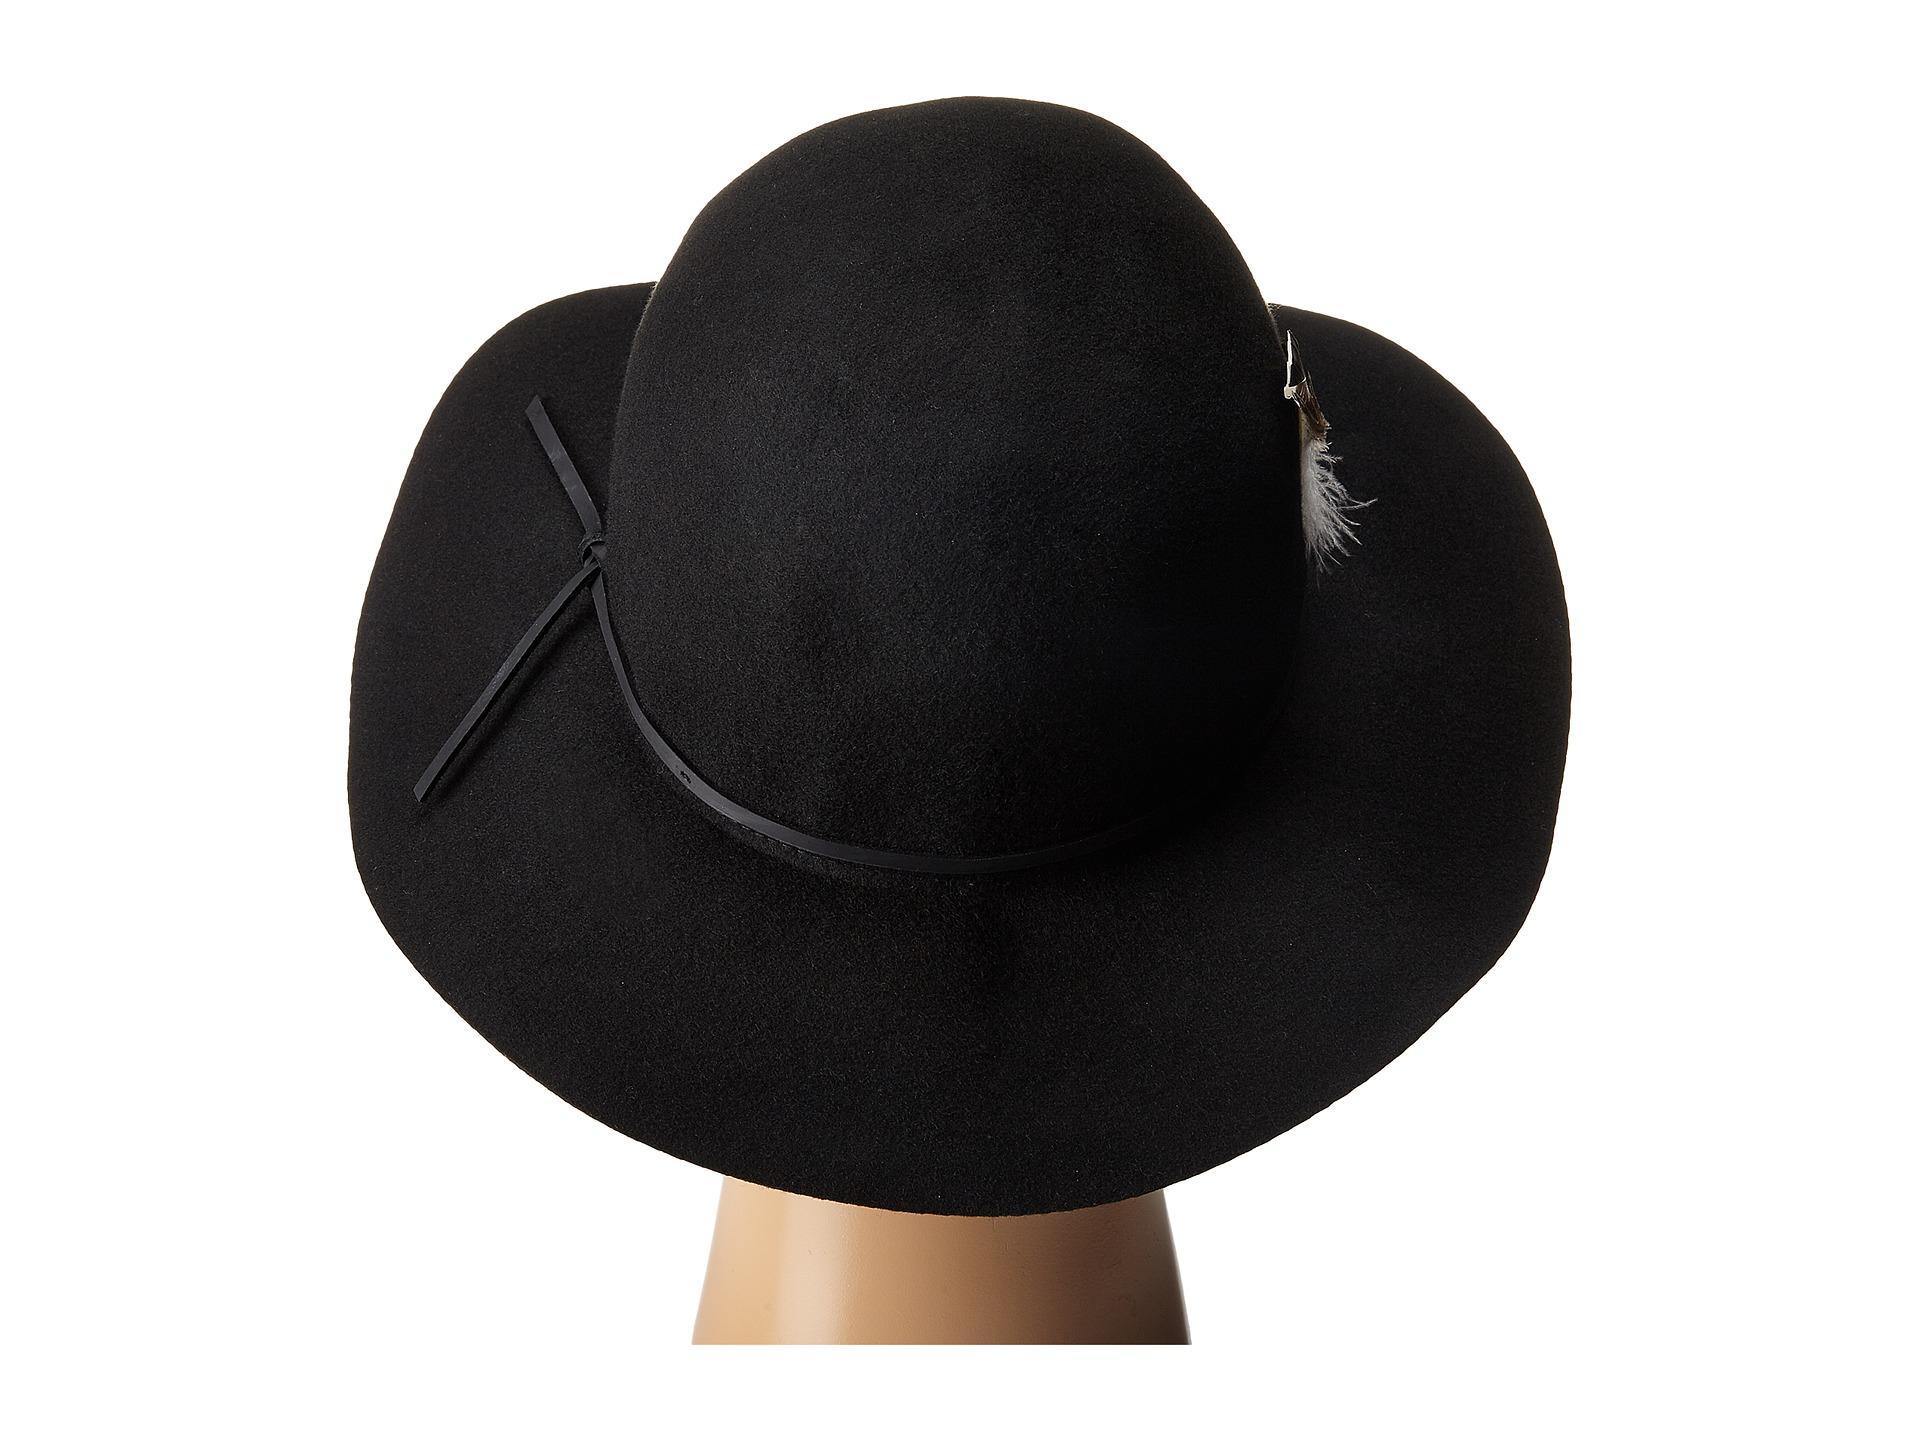 838b633a3033cd sweden lyst brixton judah hat in black acf1b 3e81f